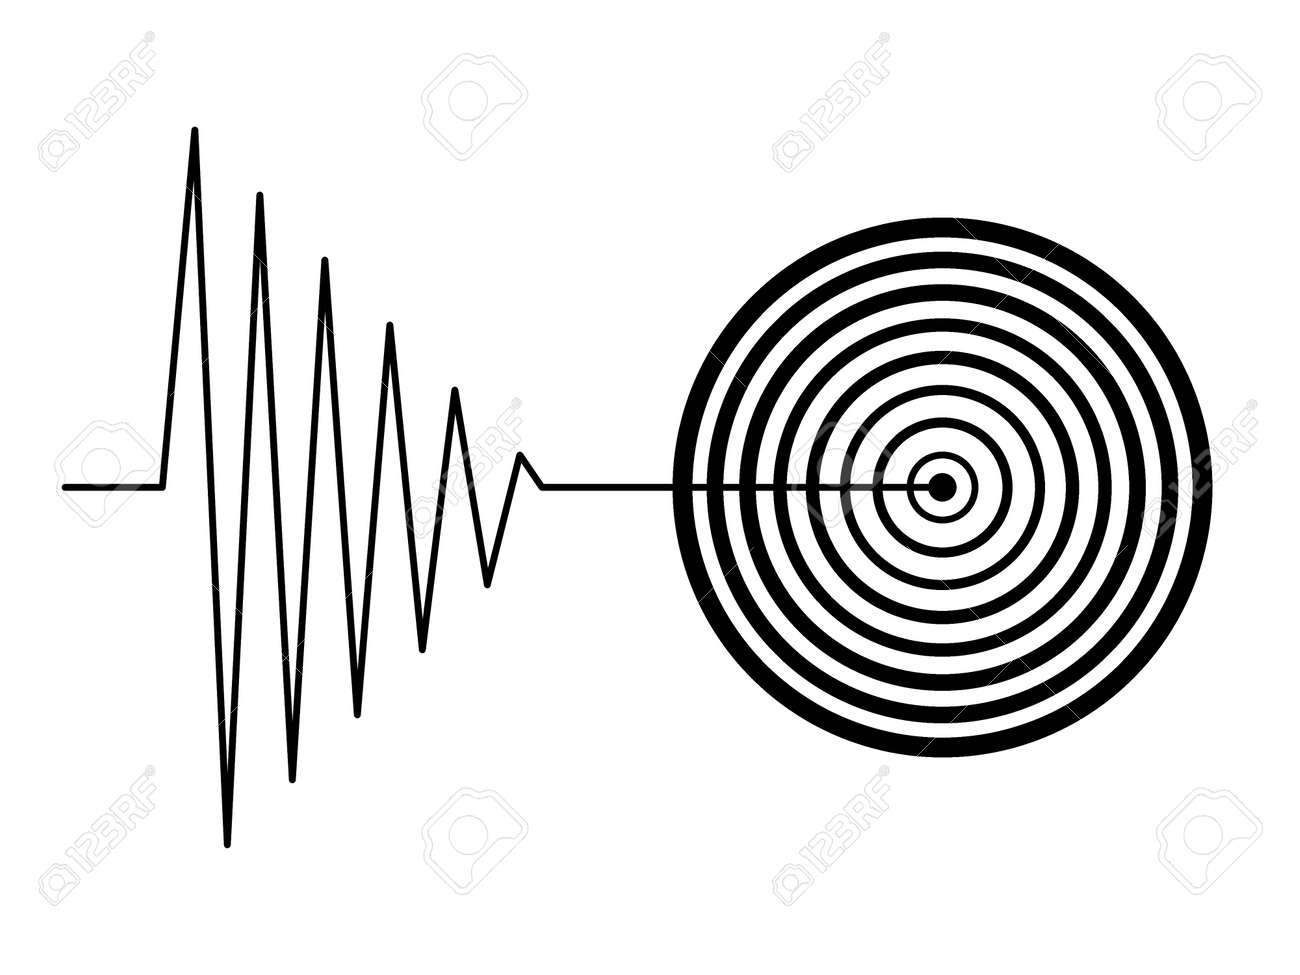 black tremor earthquake sign on white background Stock Photo - 6381598